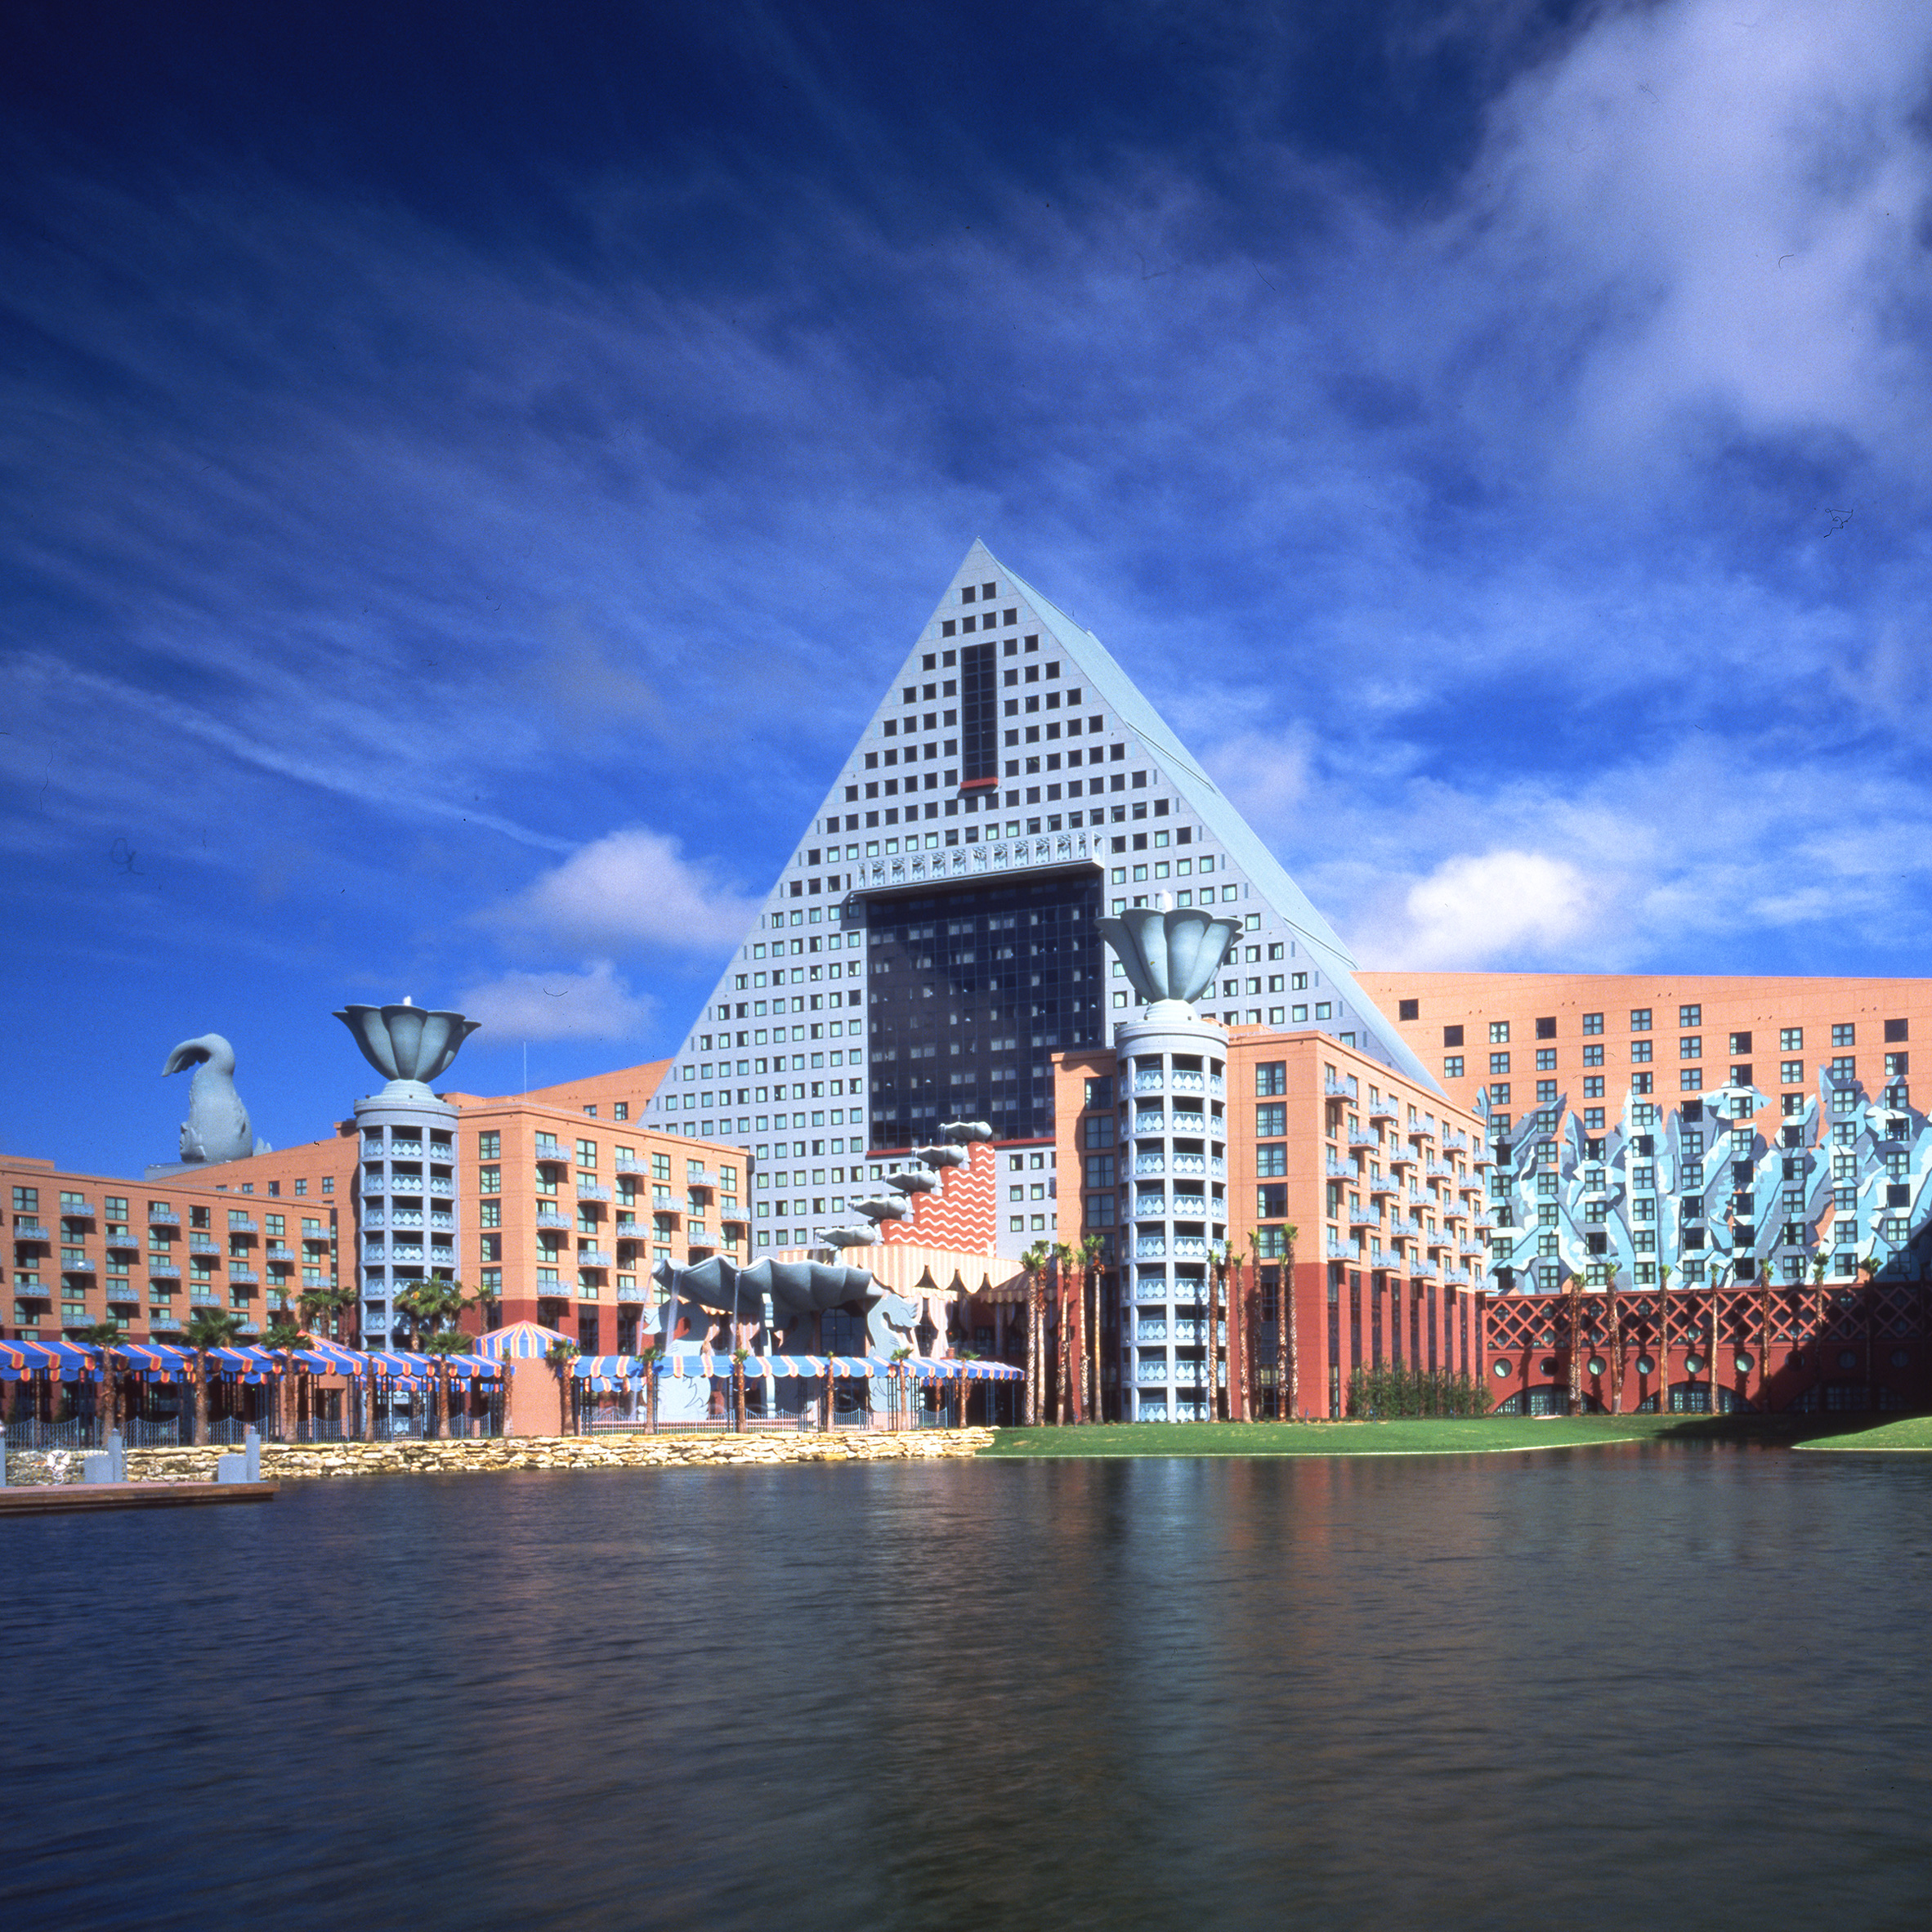 Postmodern architecture Walt Disney World Dolphin and